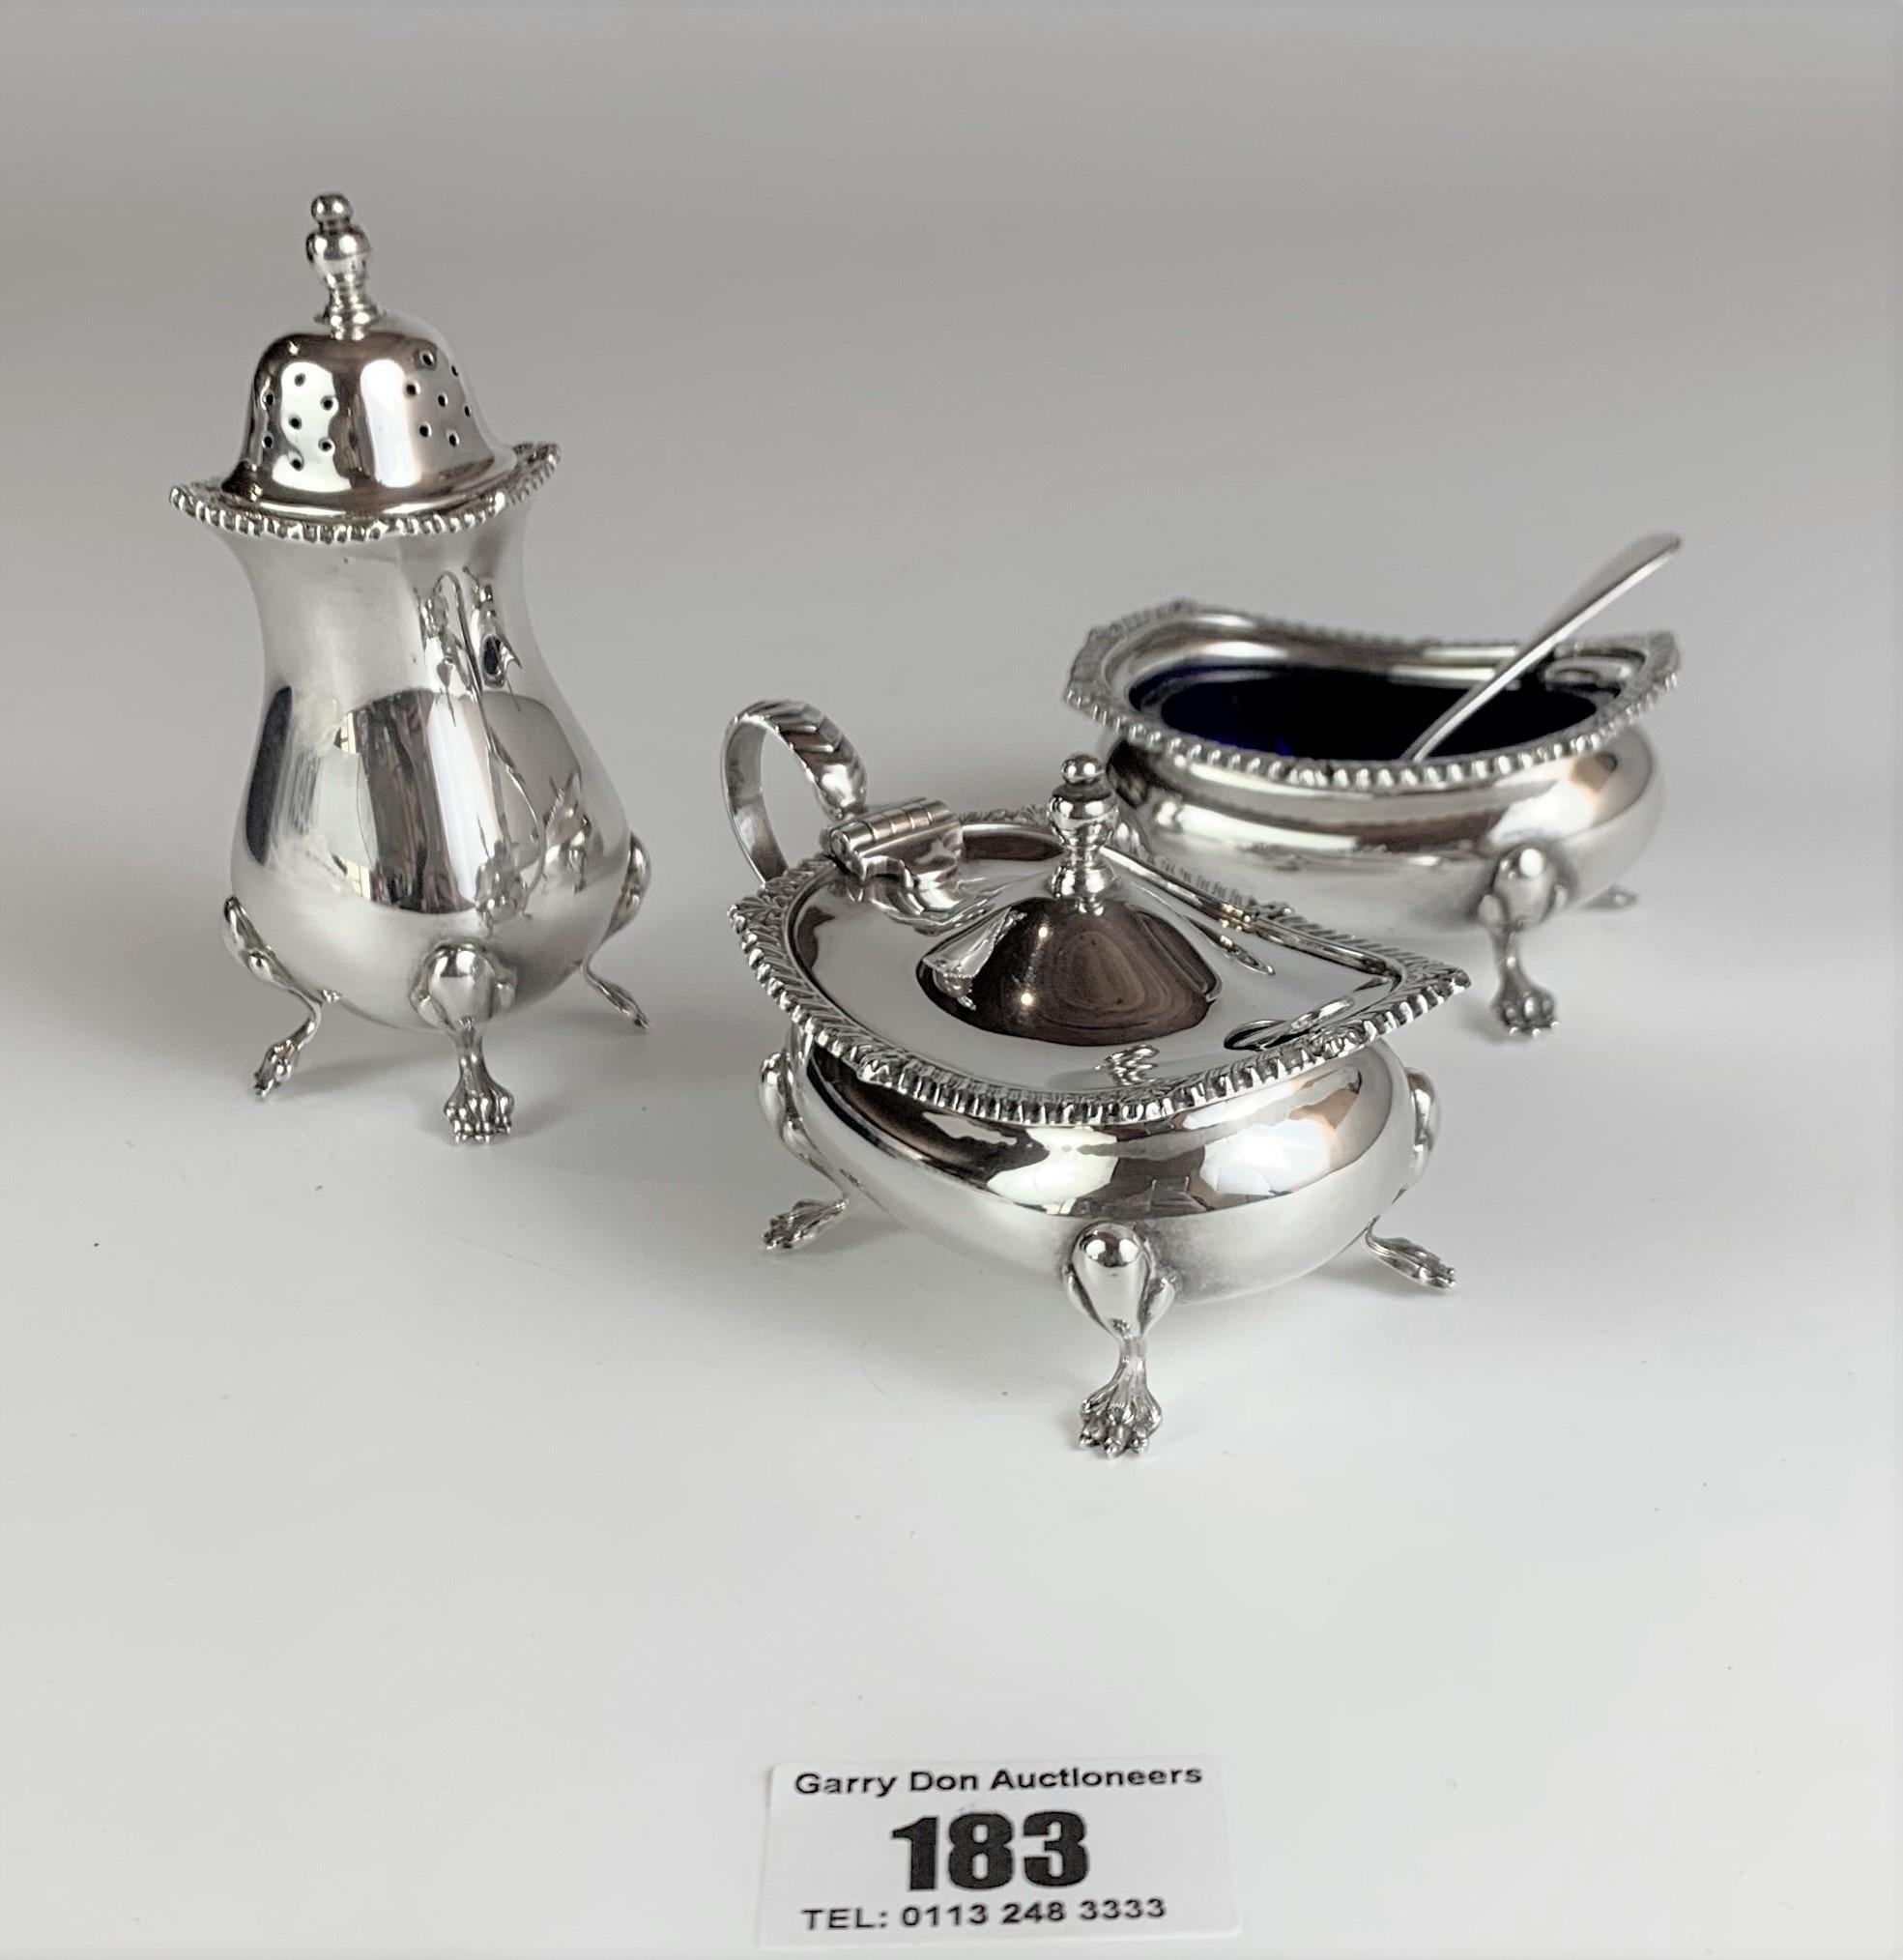 3 piece silver cruet set, pepper pot, salt dish with blue liner and spoon, mustard pot with blue